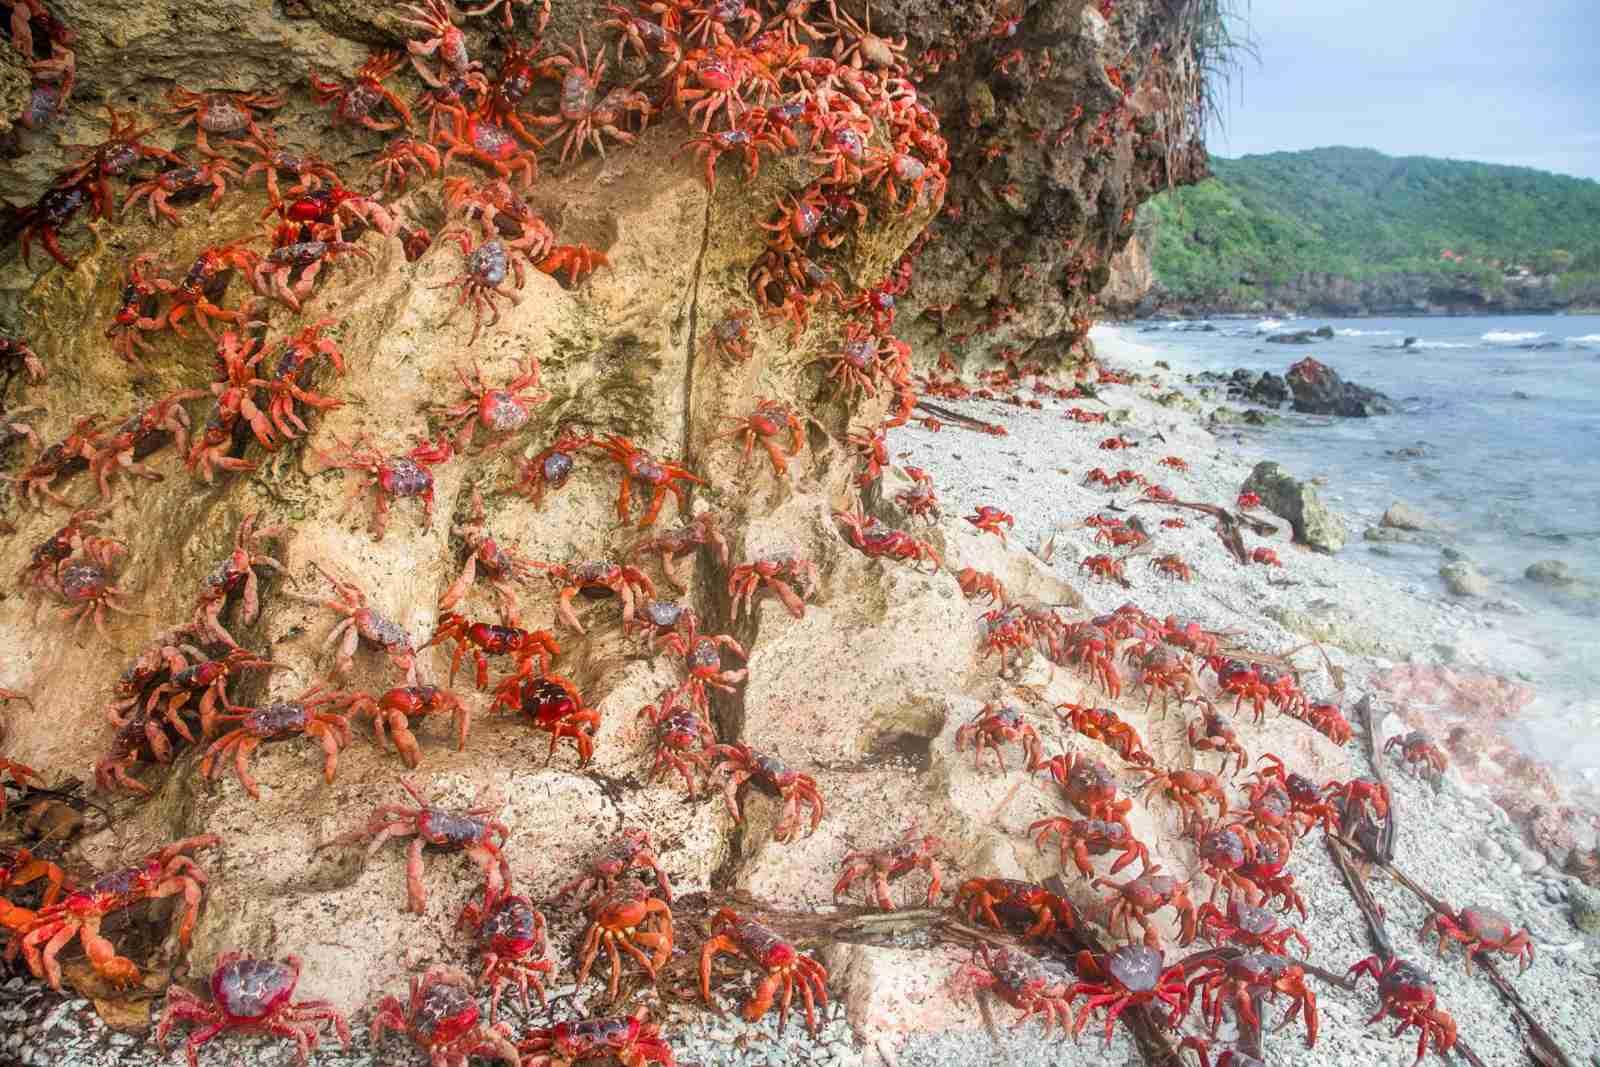 Crabs taking over at Ethel Beach on Christmas Island. (Photo by Raphael Bick via Unsplash)